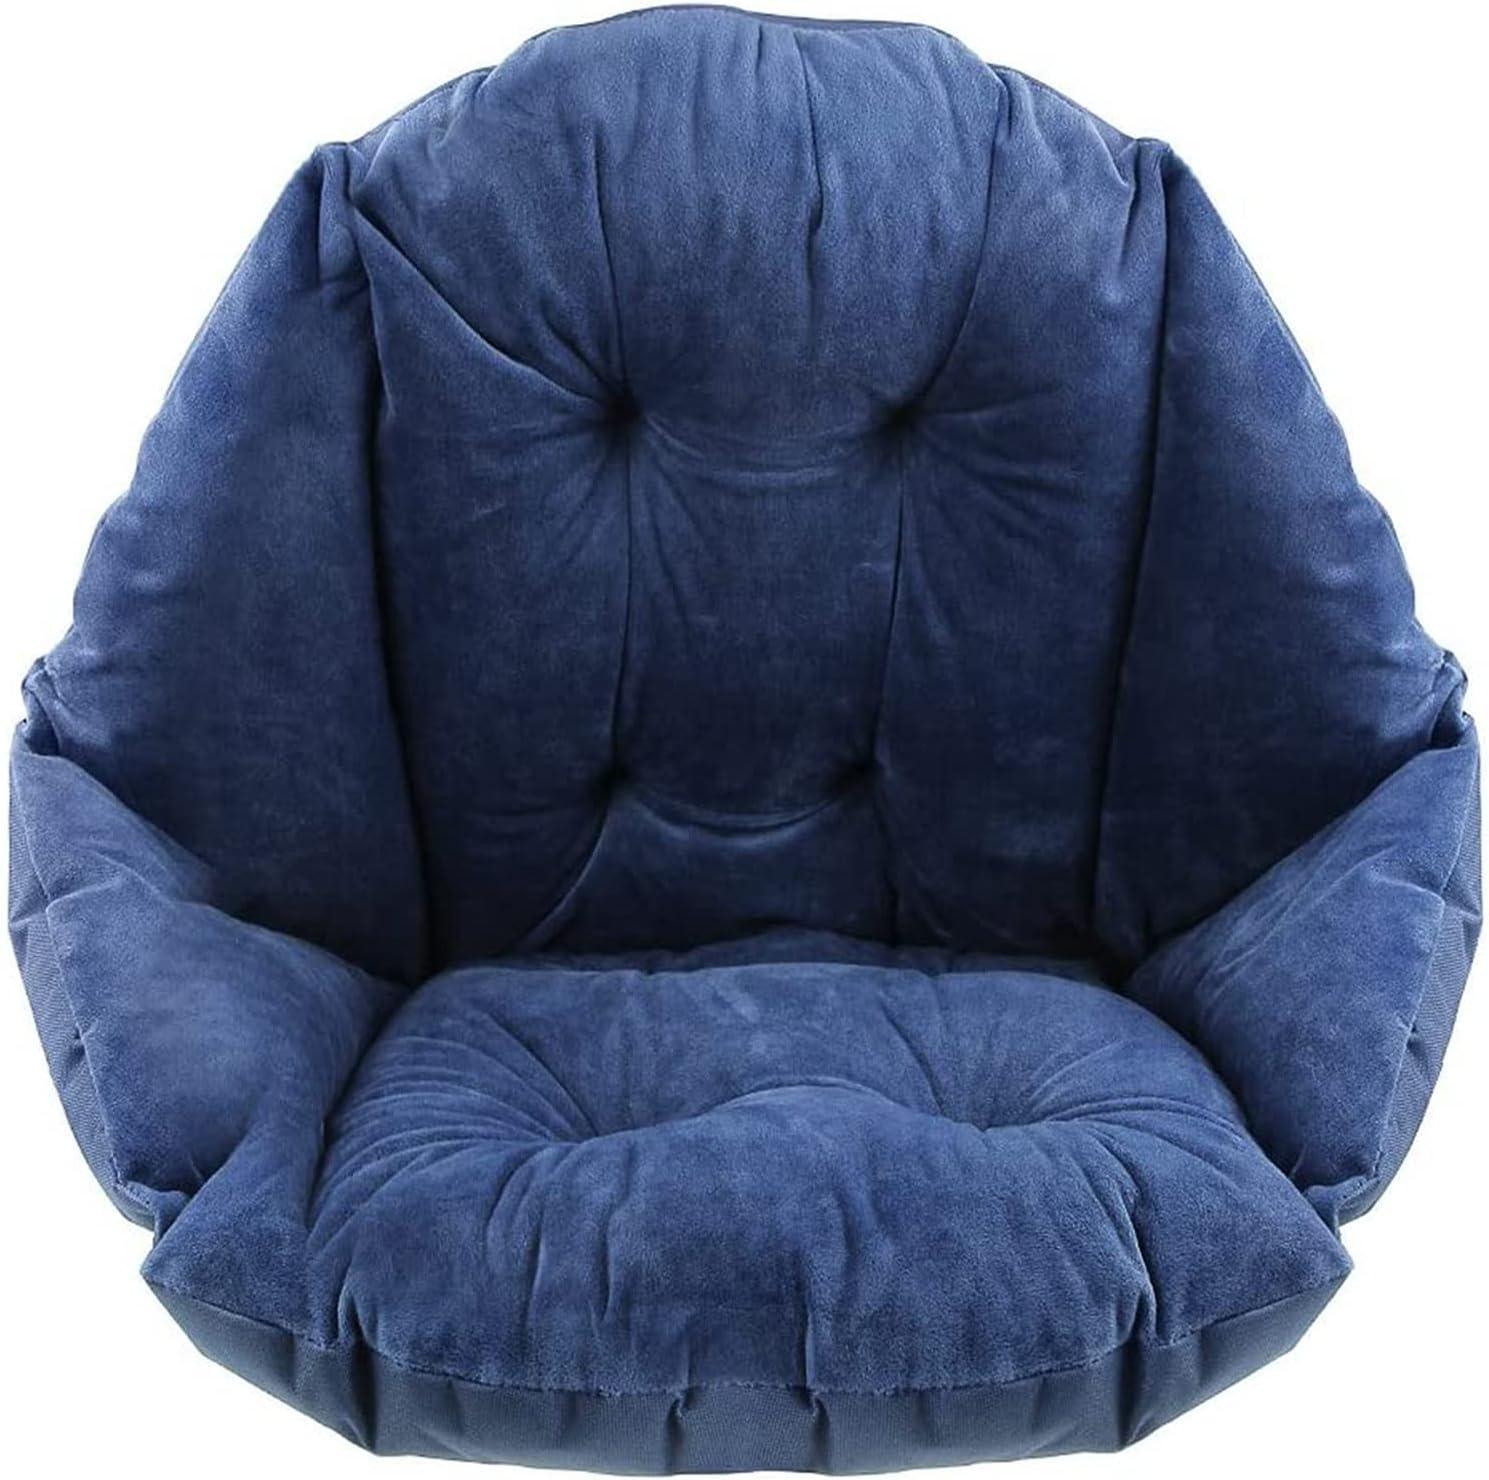 HEZIYU Seat National products Cushion Plush Warm Cushions O Chair Indoor Trust Nest